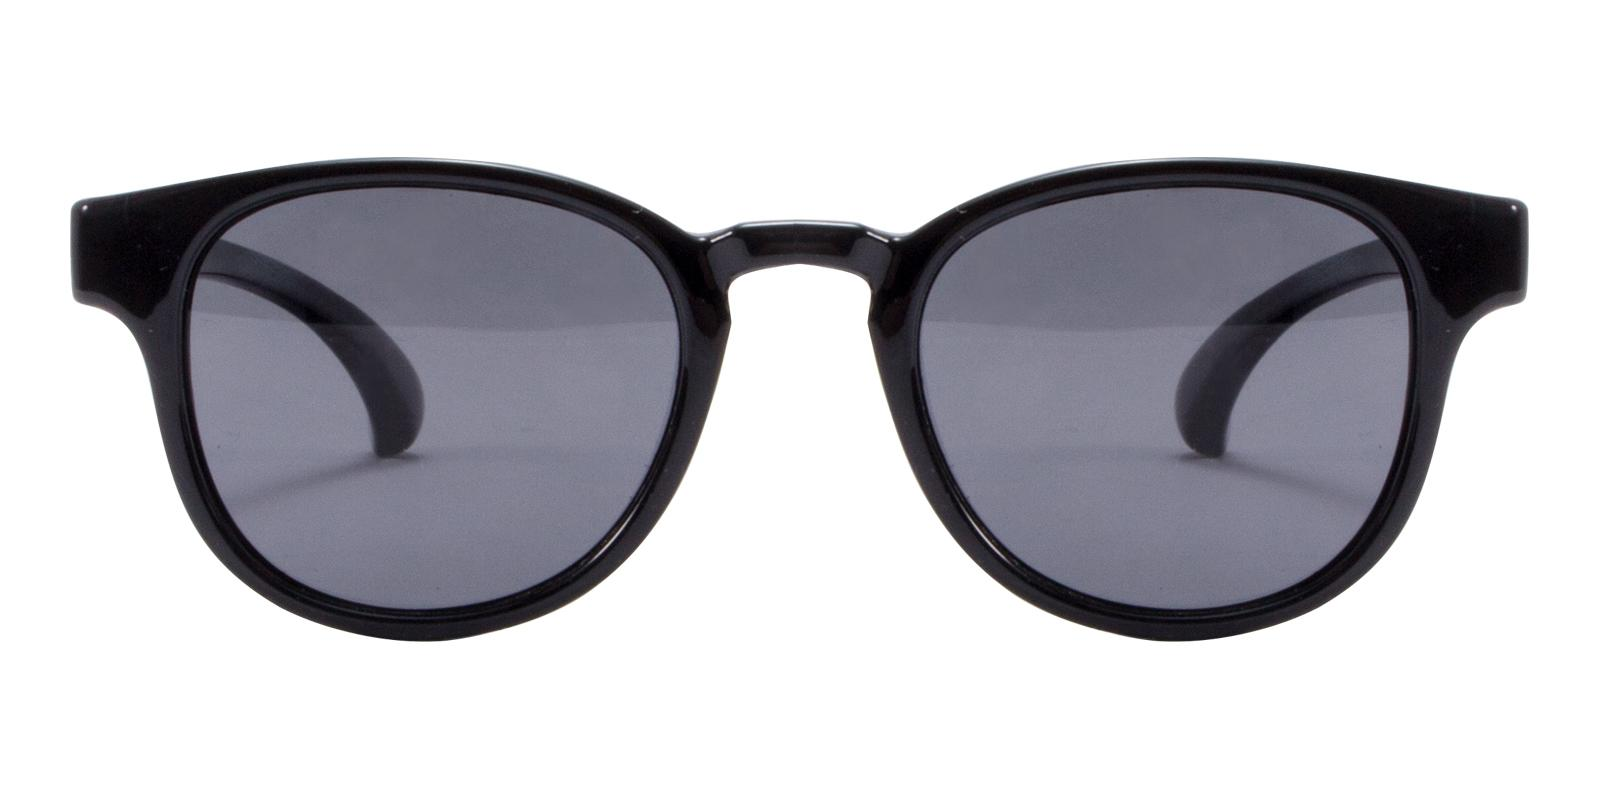 Dainty Black TR Sunglasses , UniversalBridgeFit Frames from ABBE Glasses